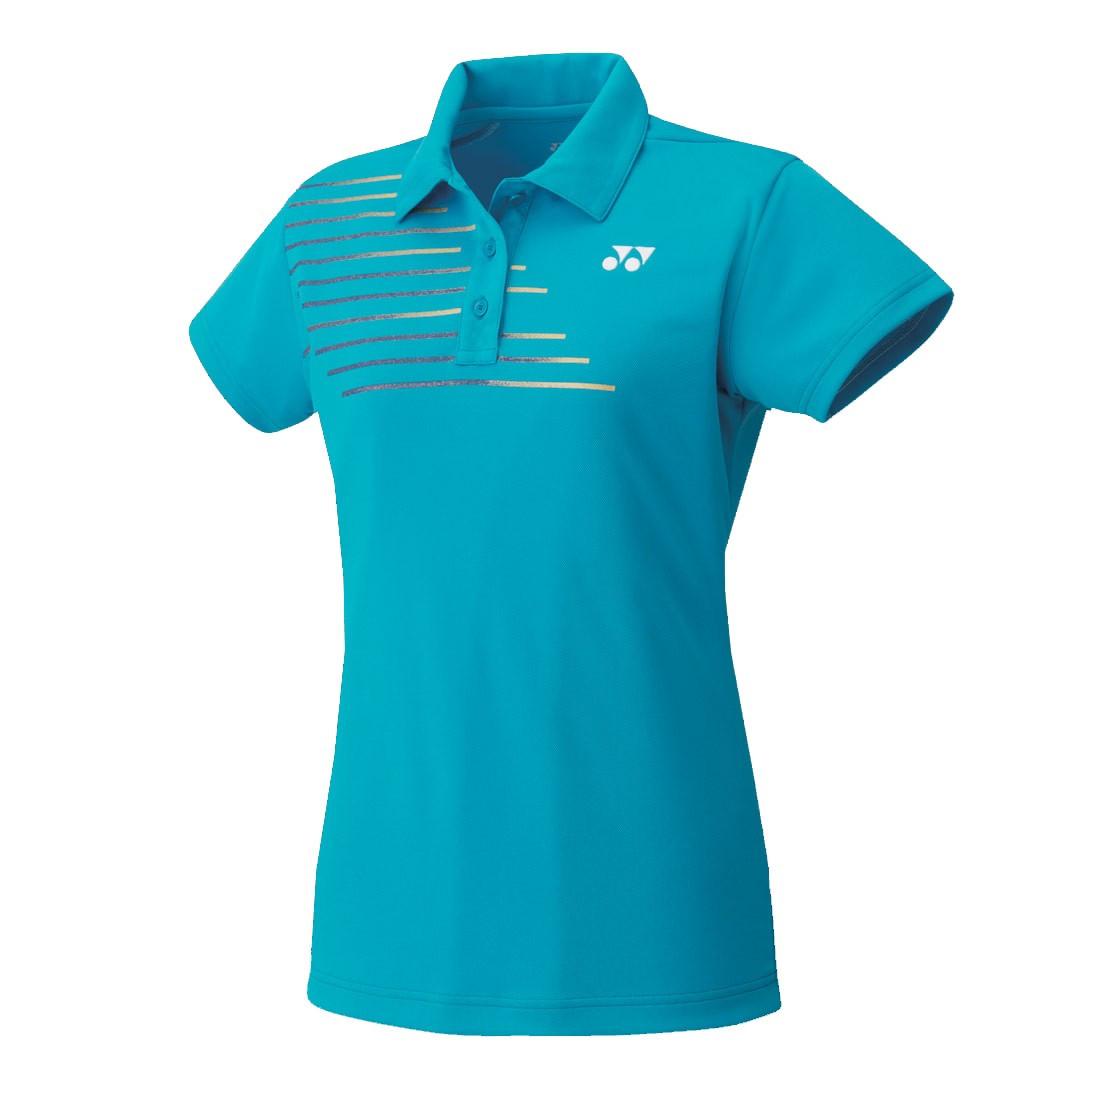 Женская футболка Yonex 20302 Women`s Polo Shirt Water Blue